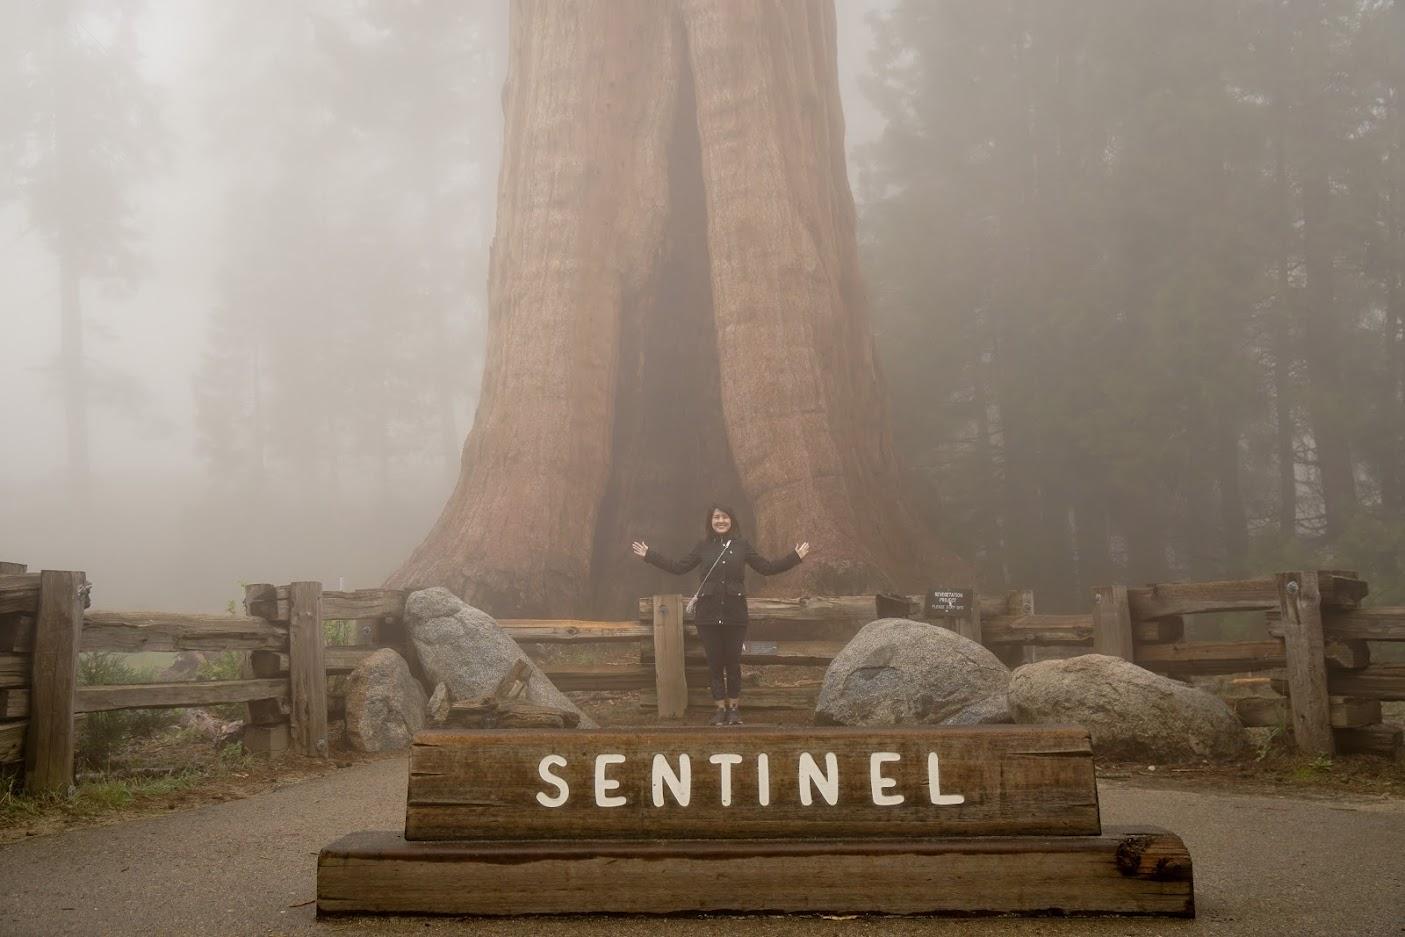 Sentinel Sequoia National Park